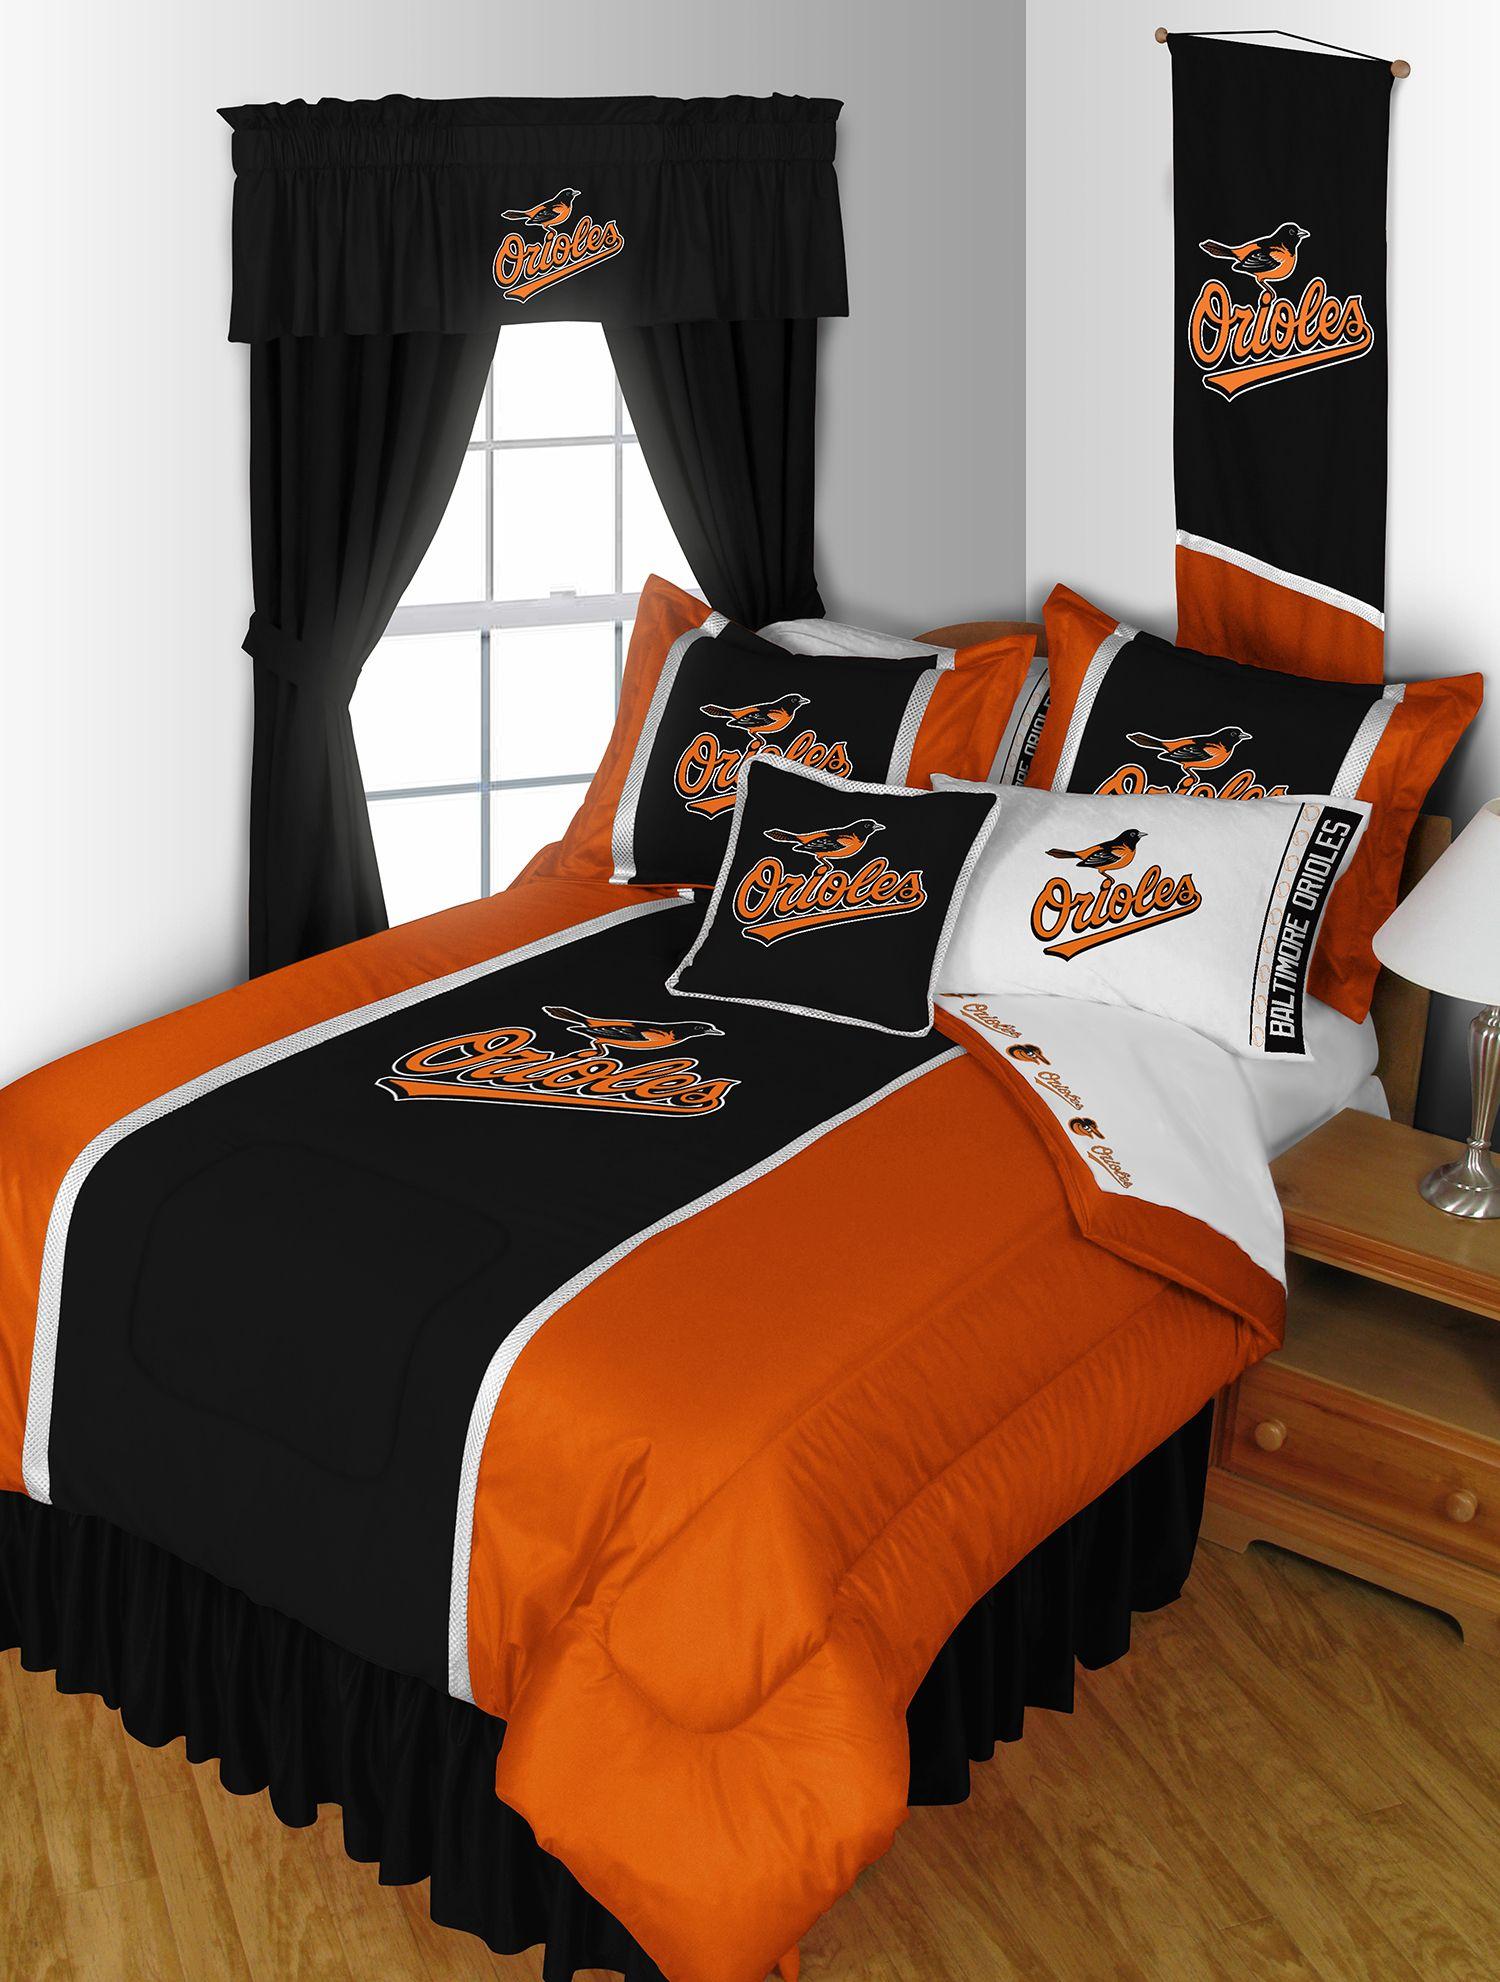 MLB Baltimore Orioles Bed Room Set